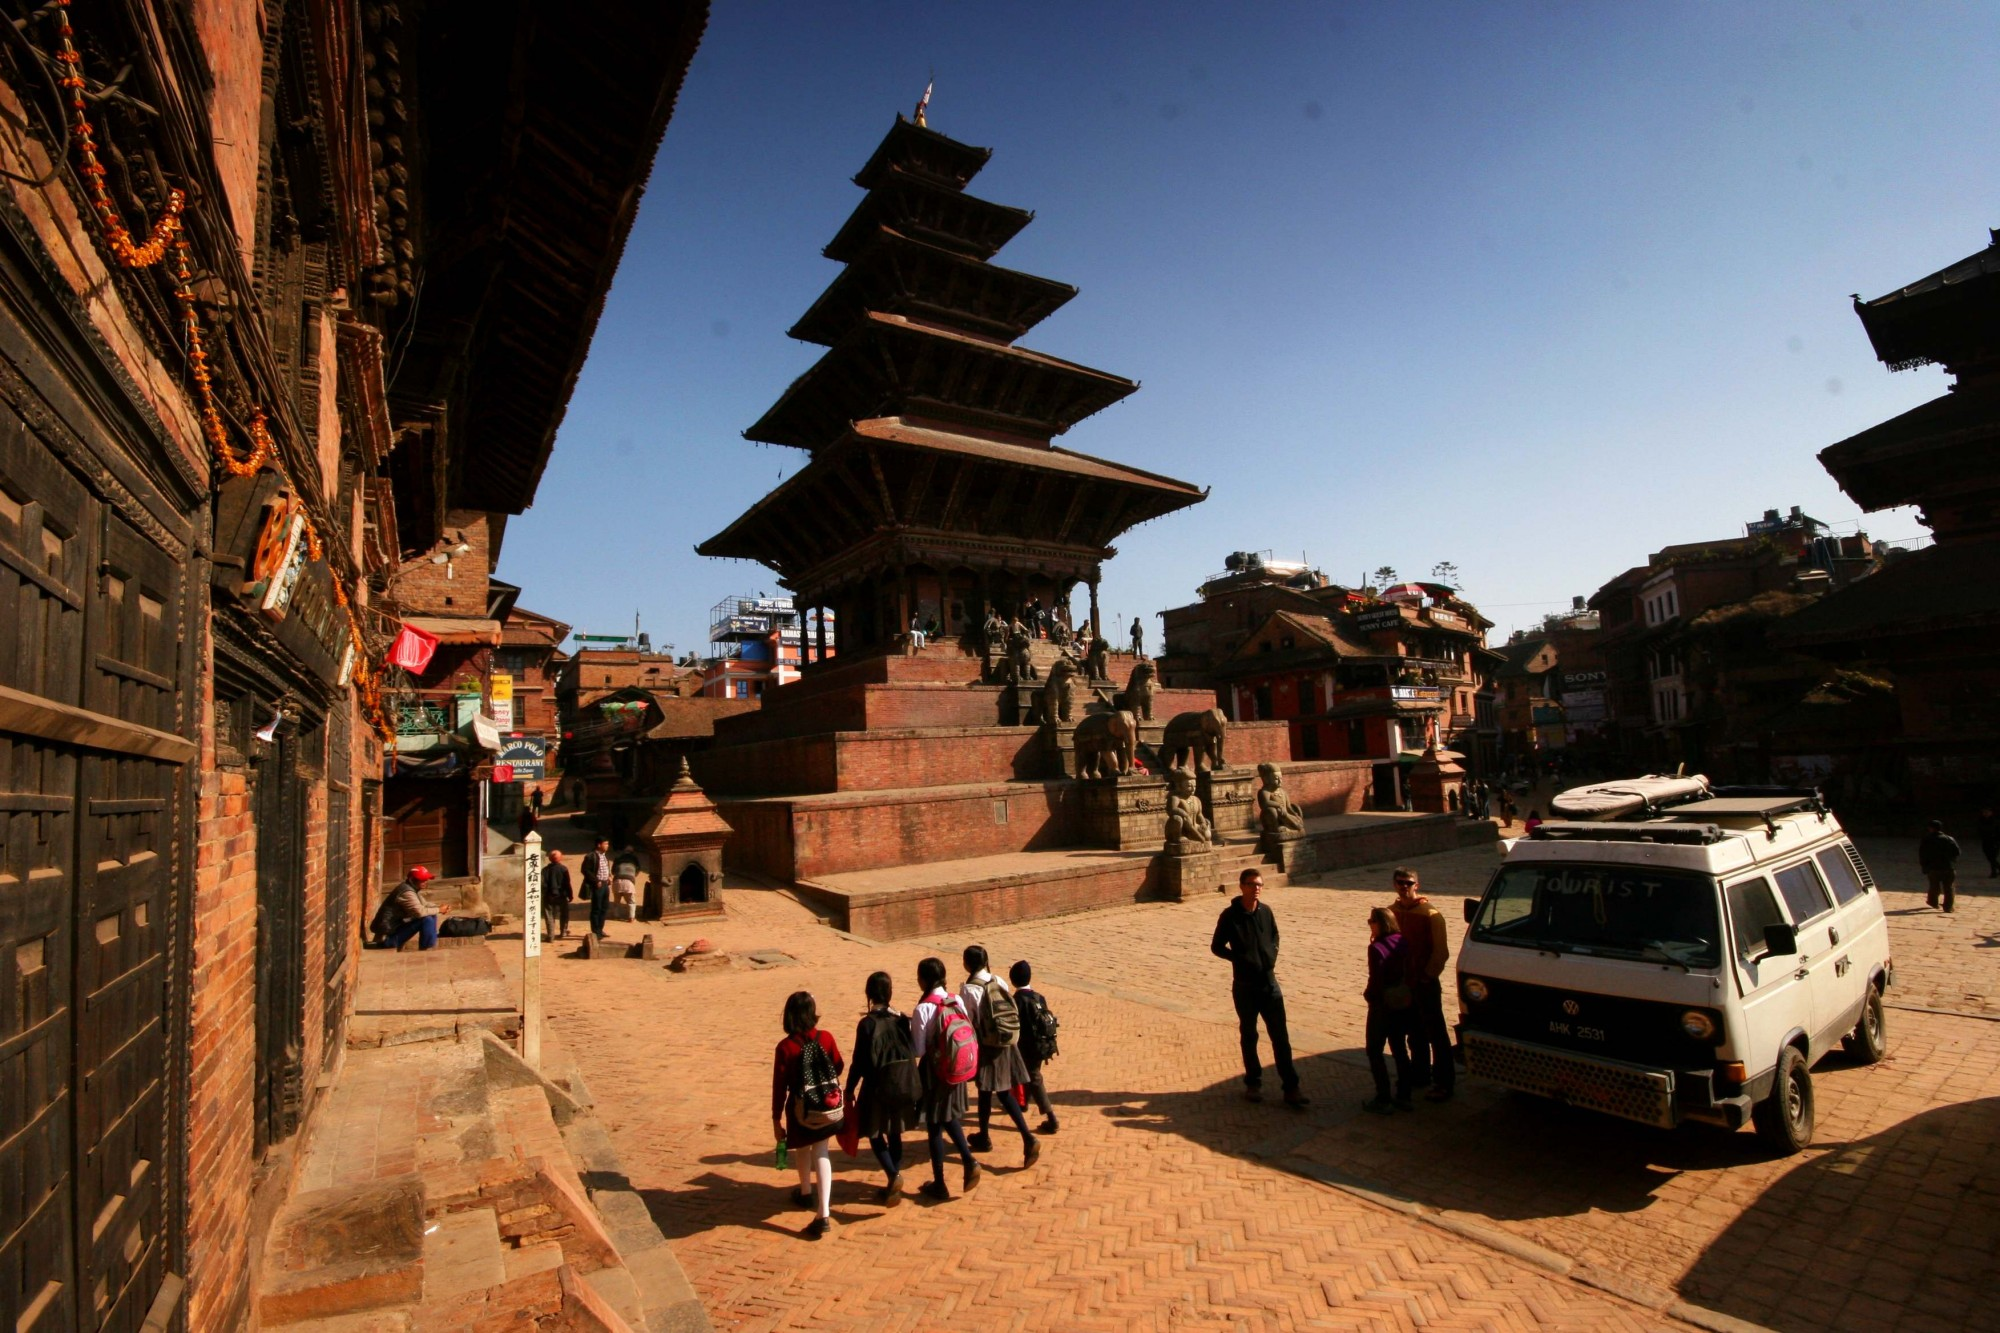 Preparing to leave Kathmandu on the day of the Maoist strike